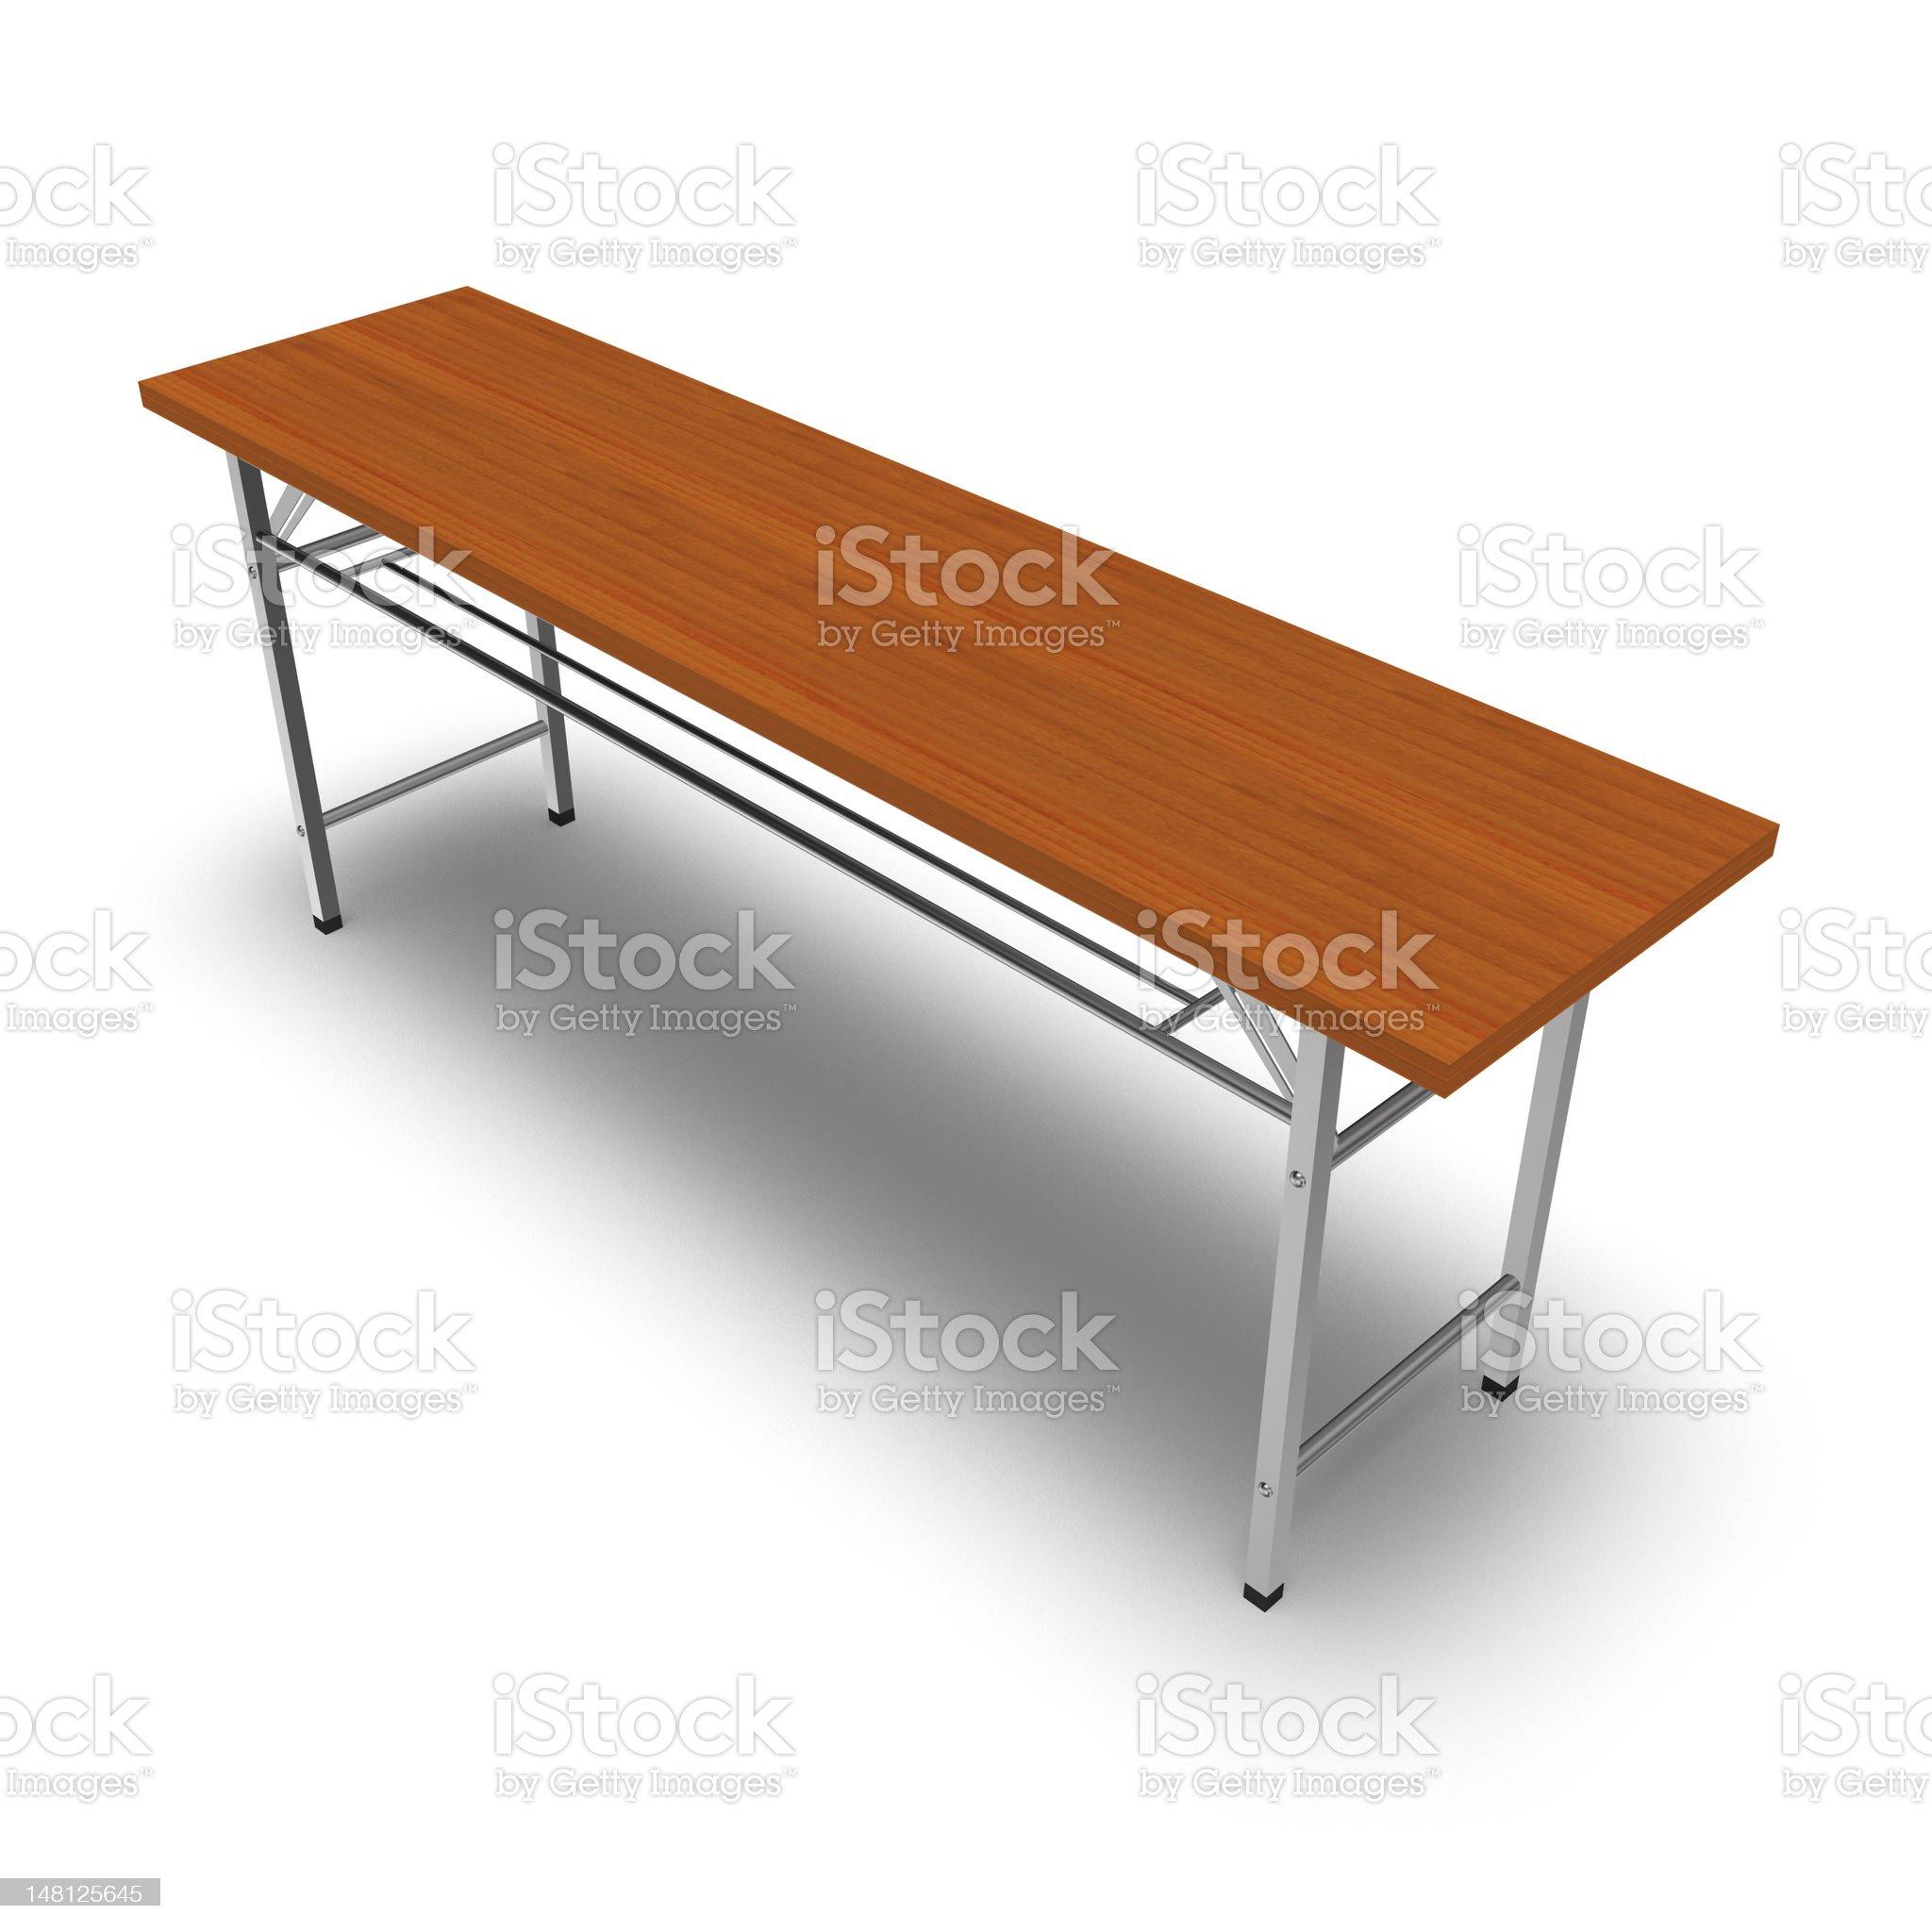 Folding desk royalty-free stock photo